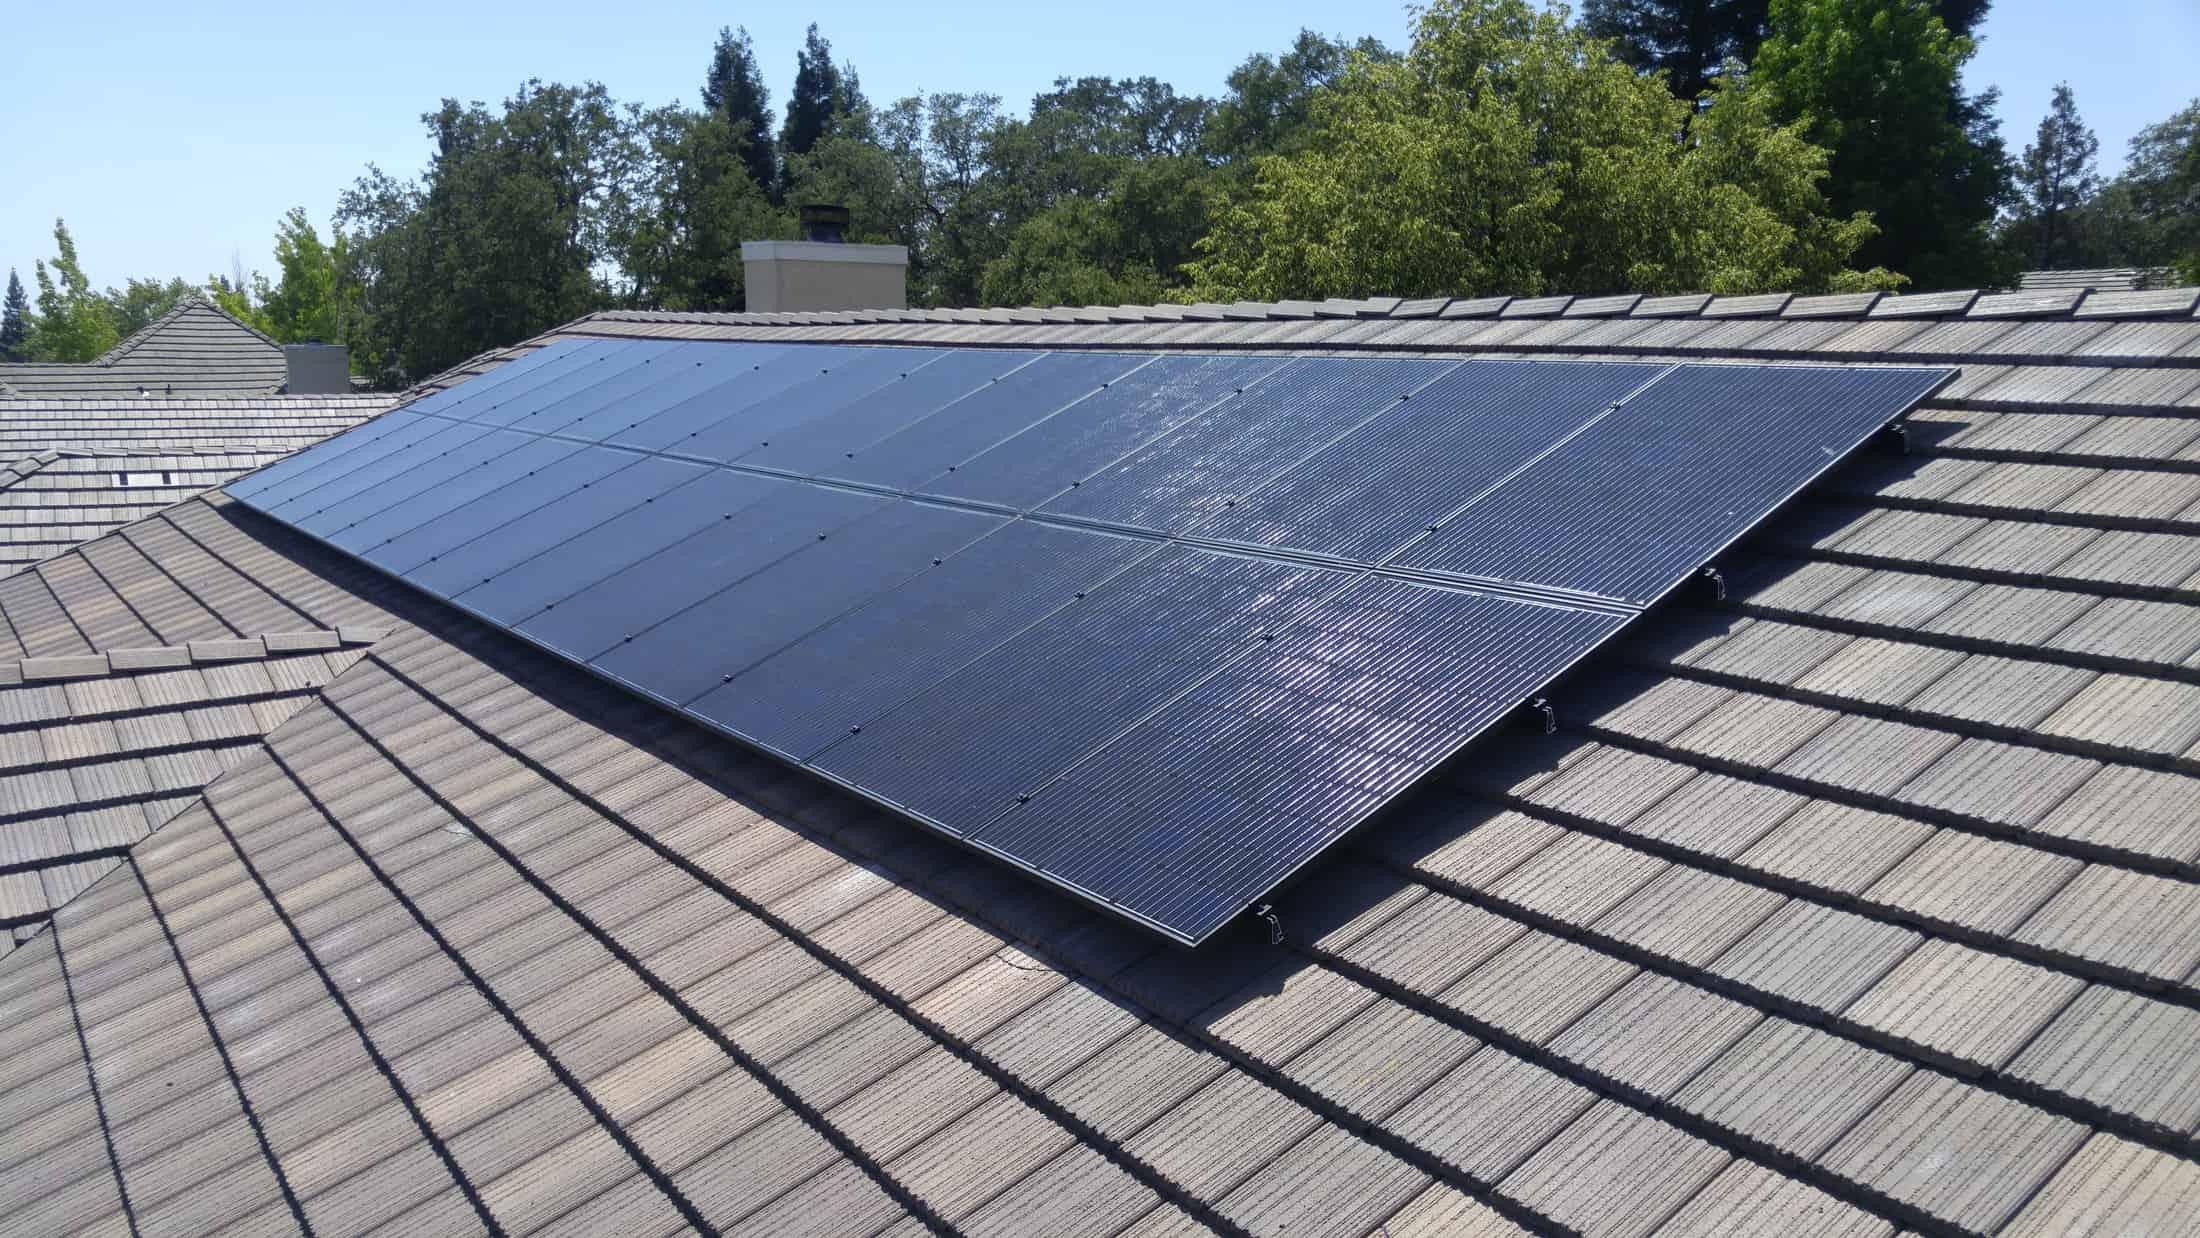 Install On Concrete Tiles Solar Install Solar Panels